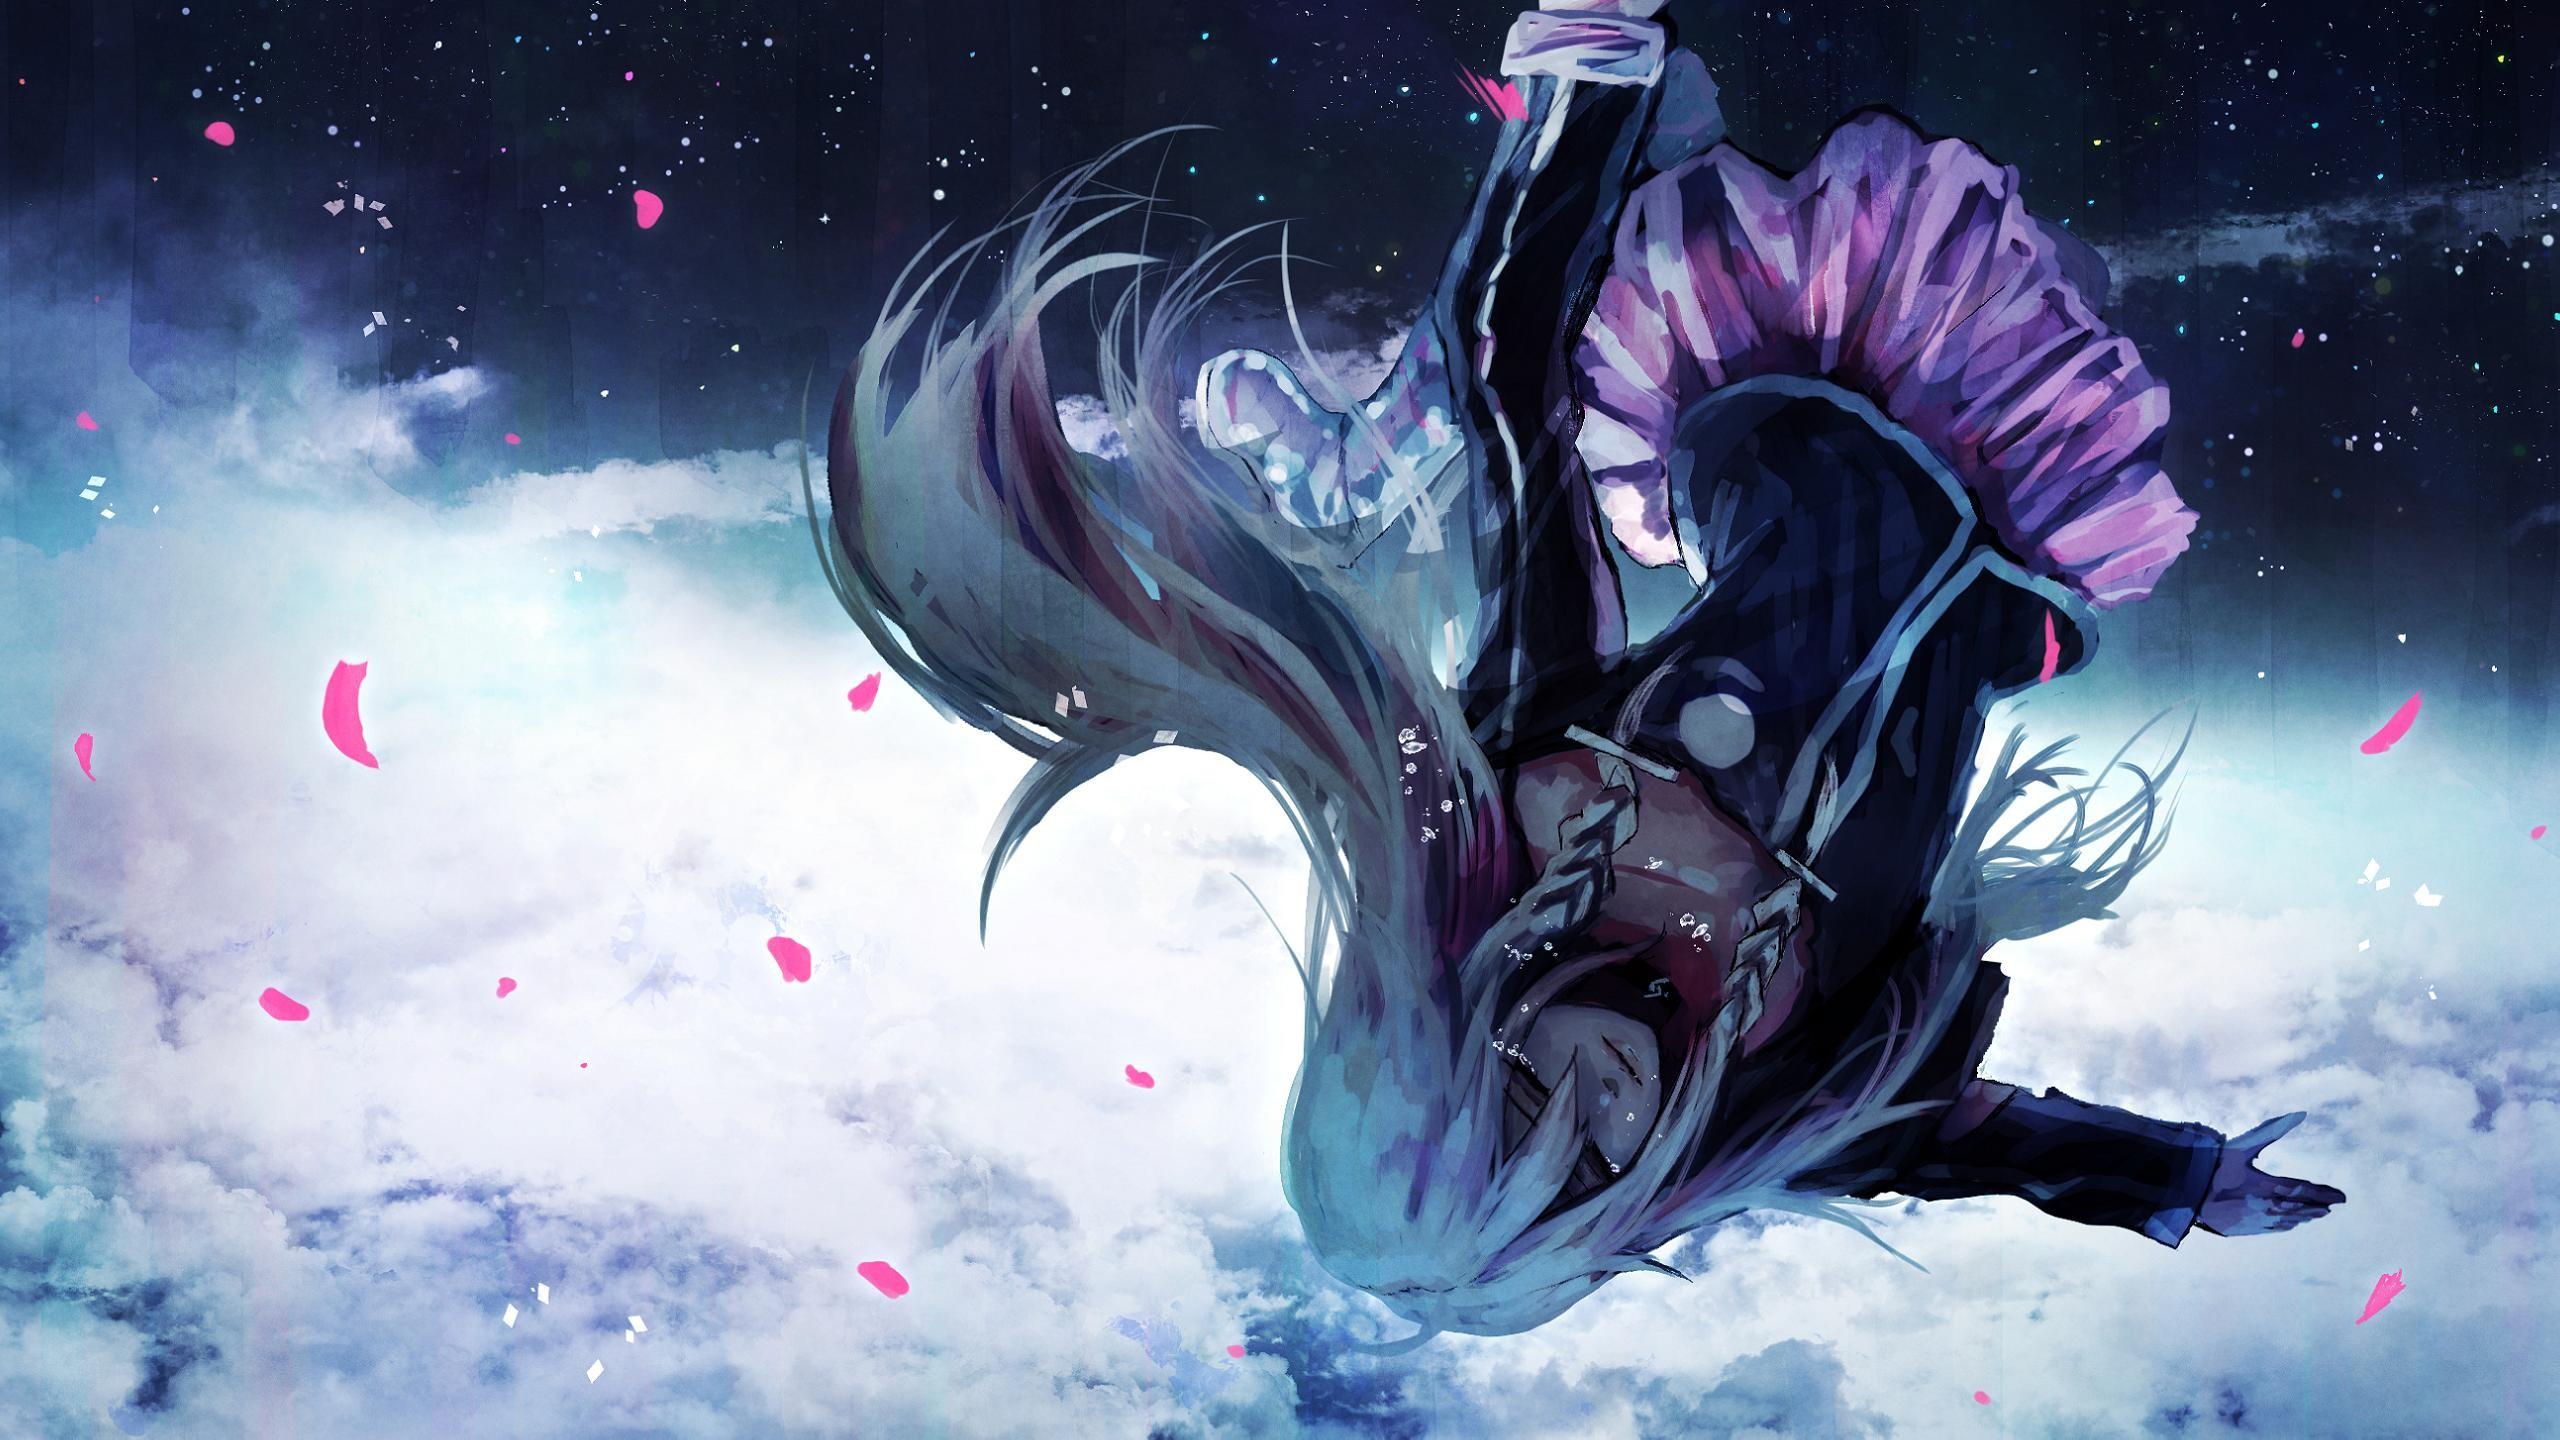 Fall Anime Wallpaper Vocaloid Deemo Wallpaper 76 Images